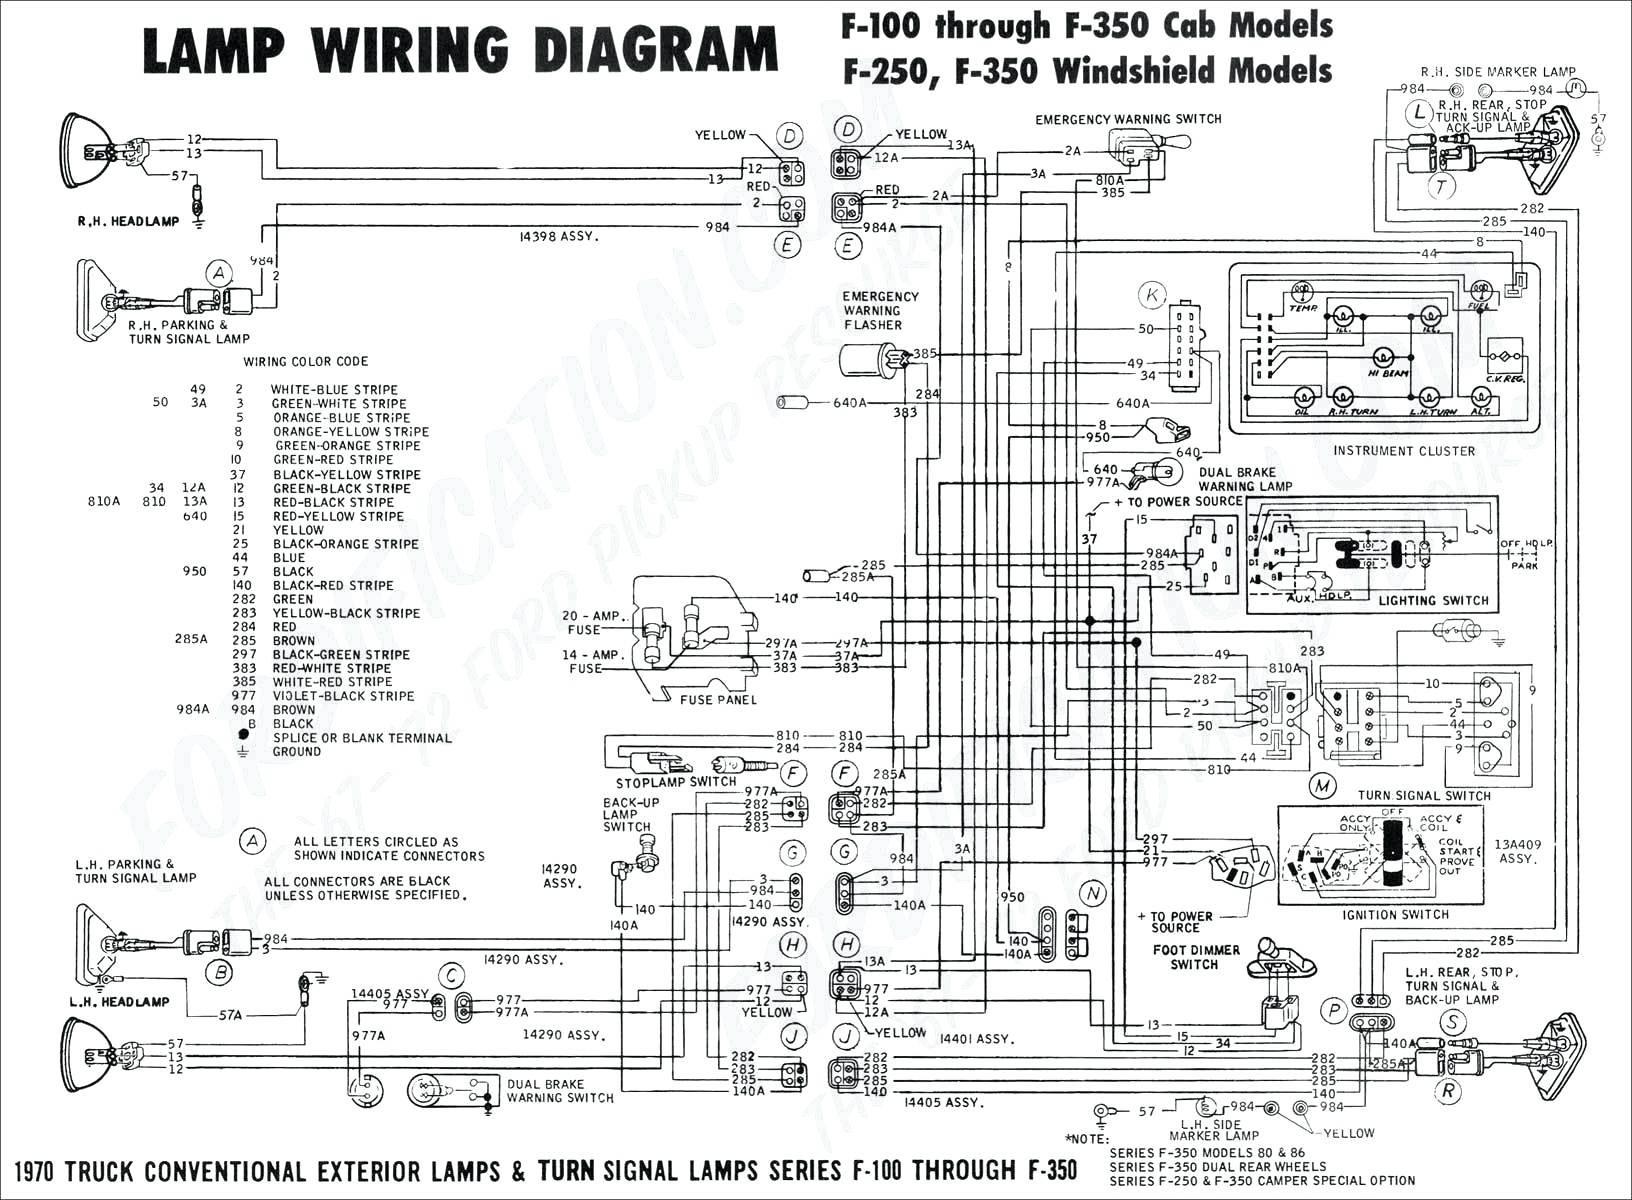 2006 honda civic engine diagram 1999 honda accord radio wiring diagram simple also honda civic